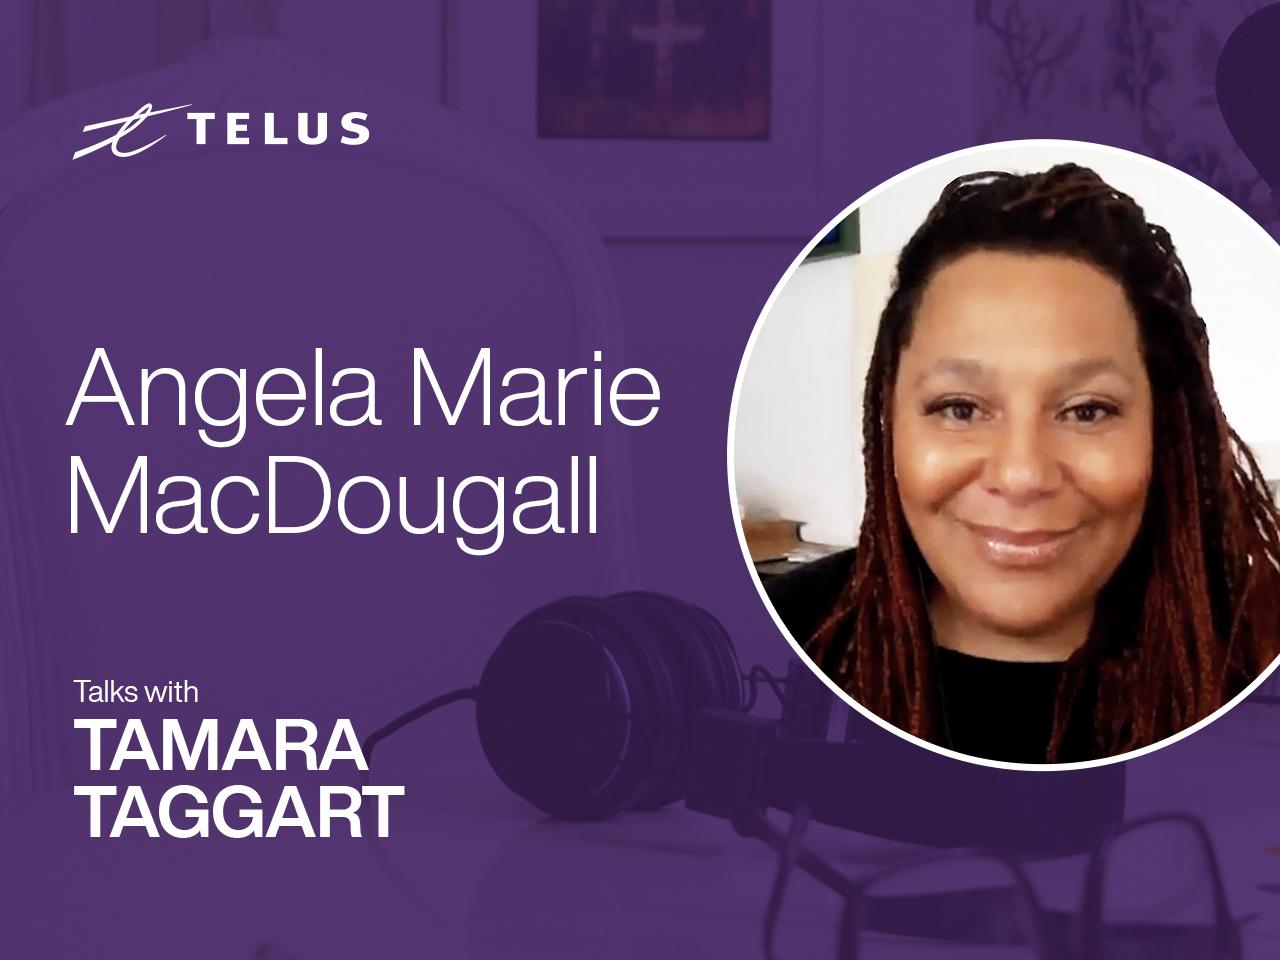 Angela Marie MacDougall